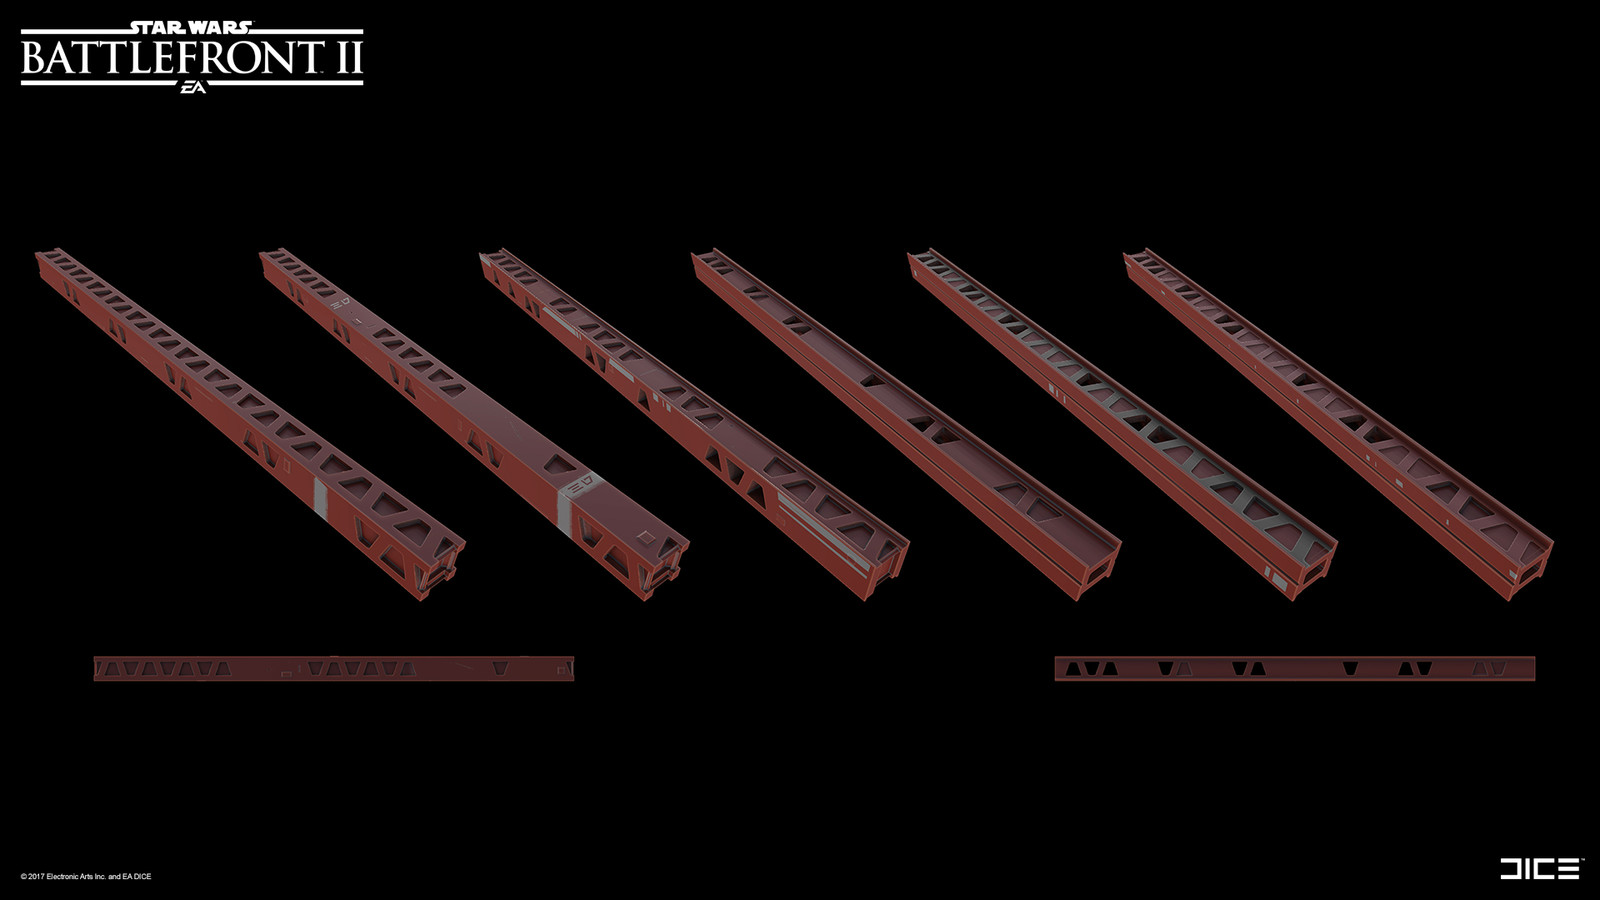 A modular beam system for Death Star 2.